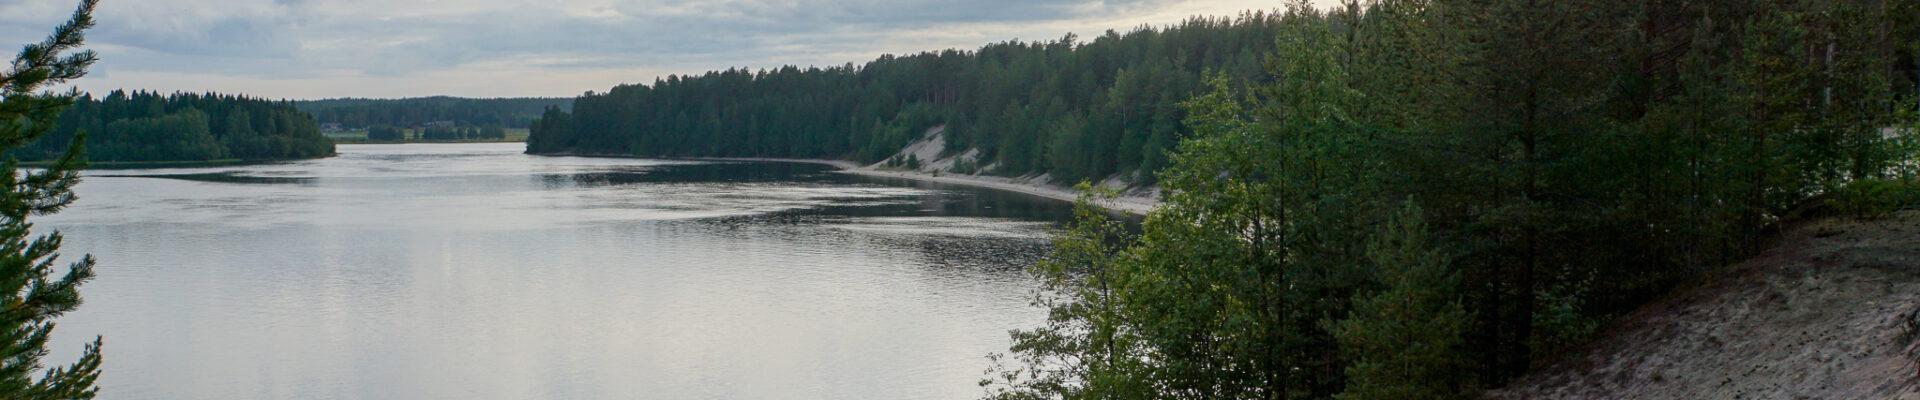 Niporna, Luleå